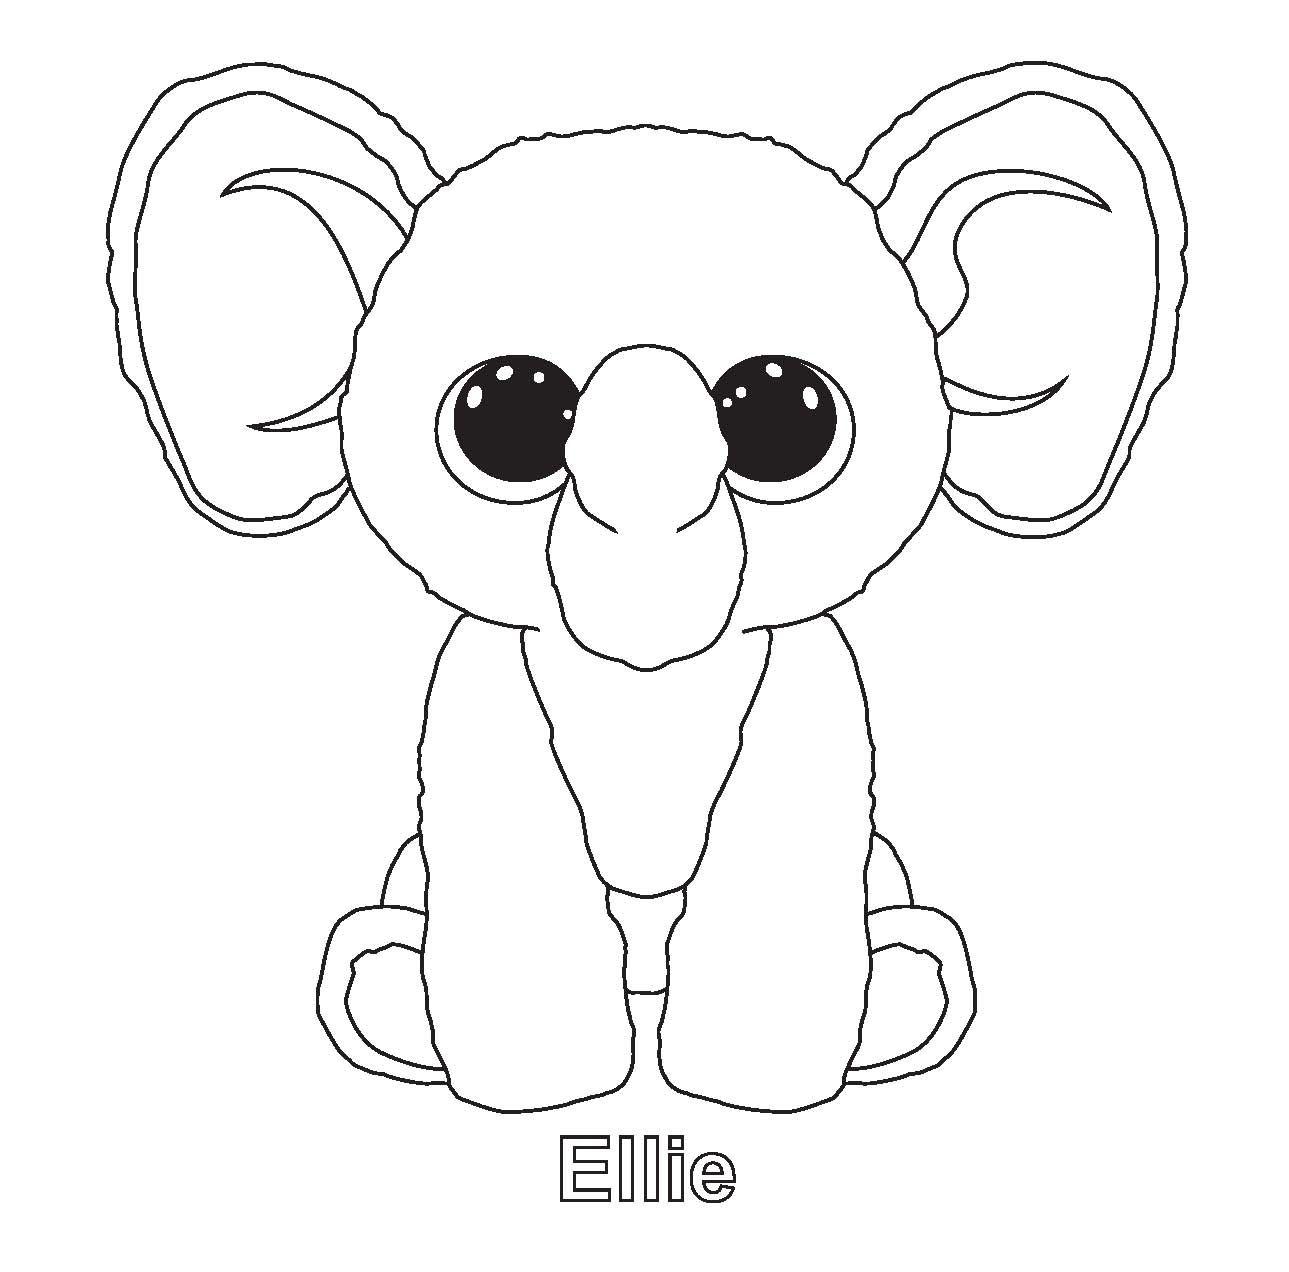 Print Moonlight Beanie Boo Coloring Pages Beanie Boo – Cute766